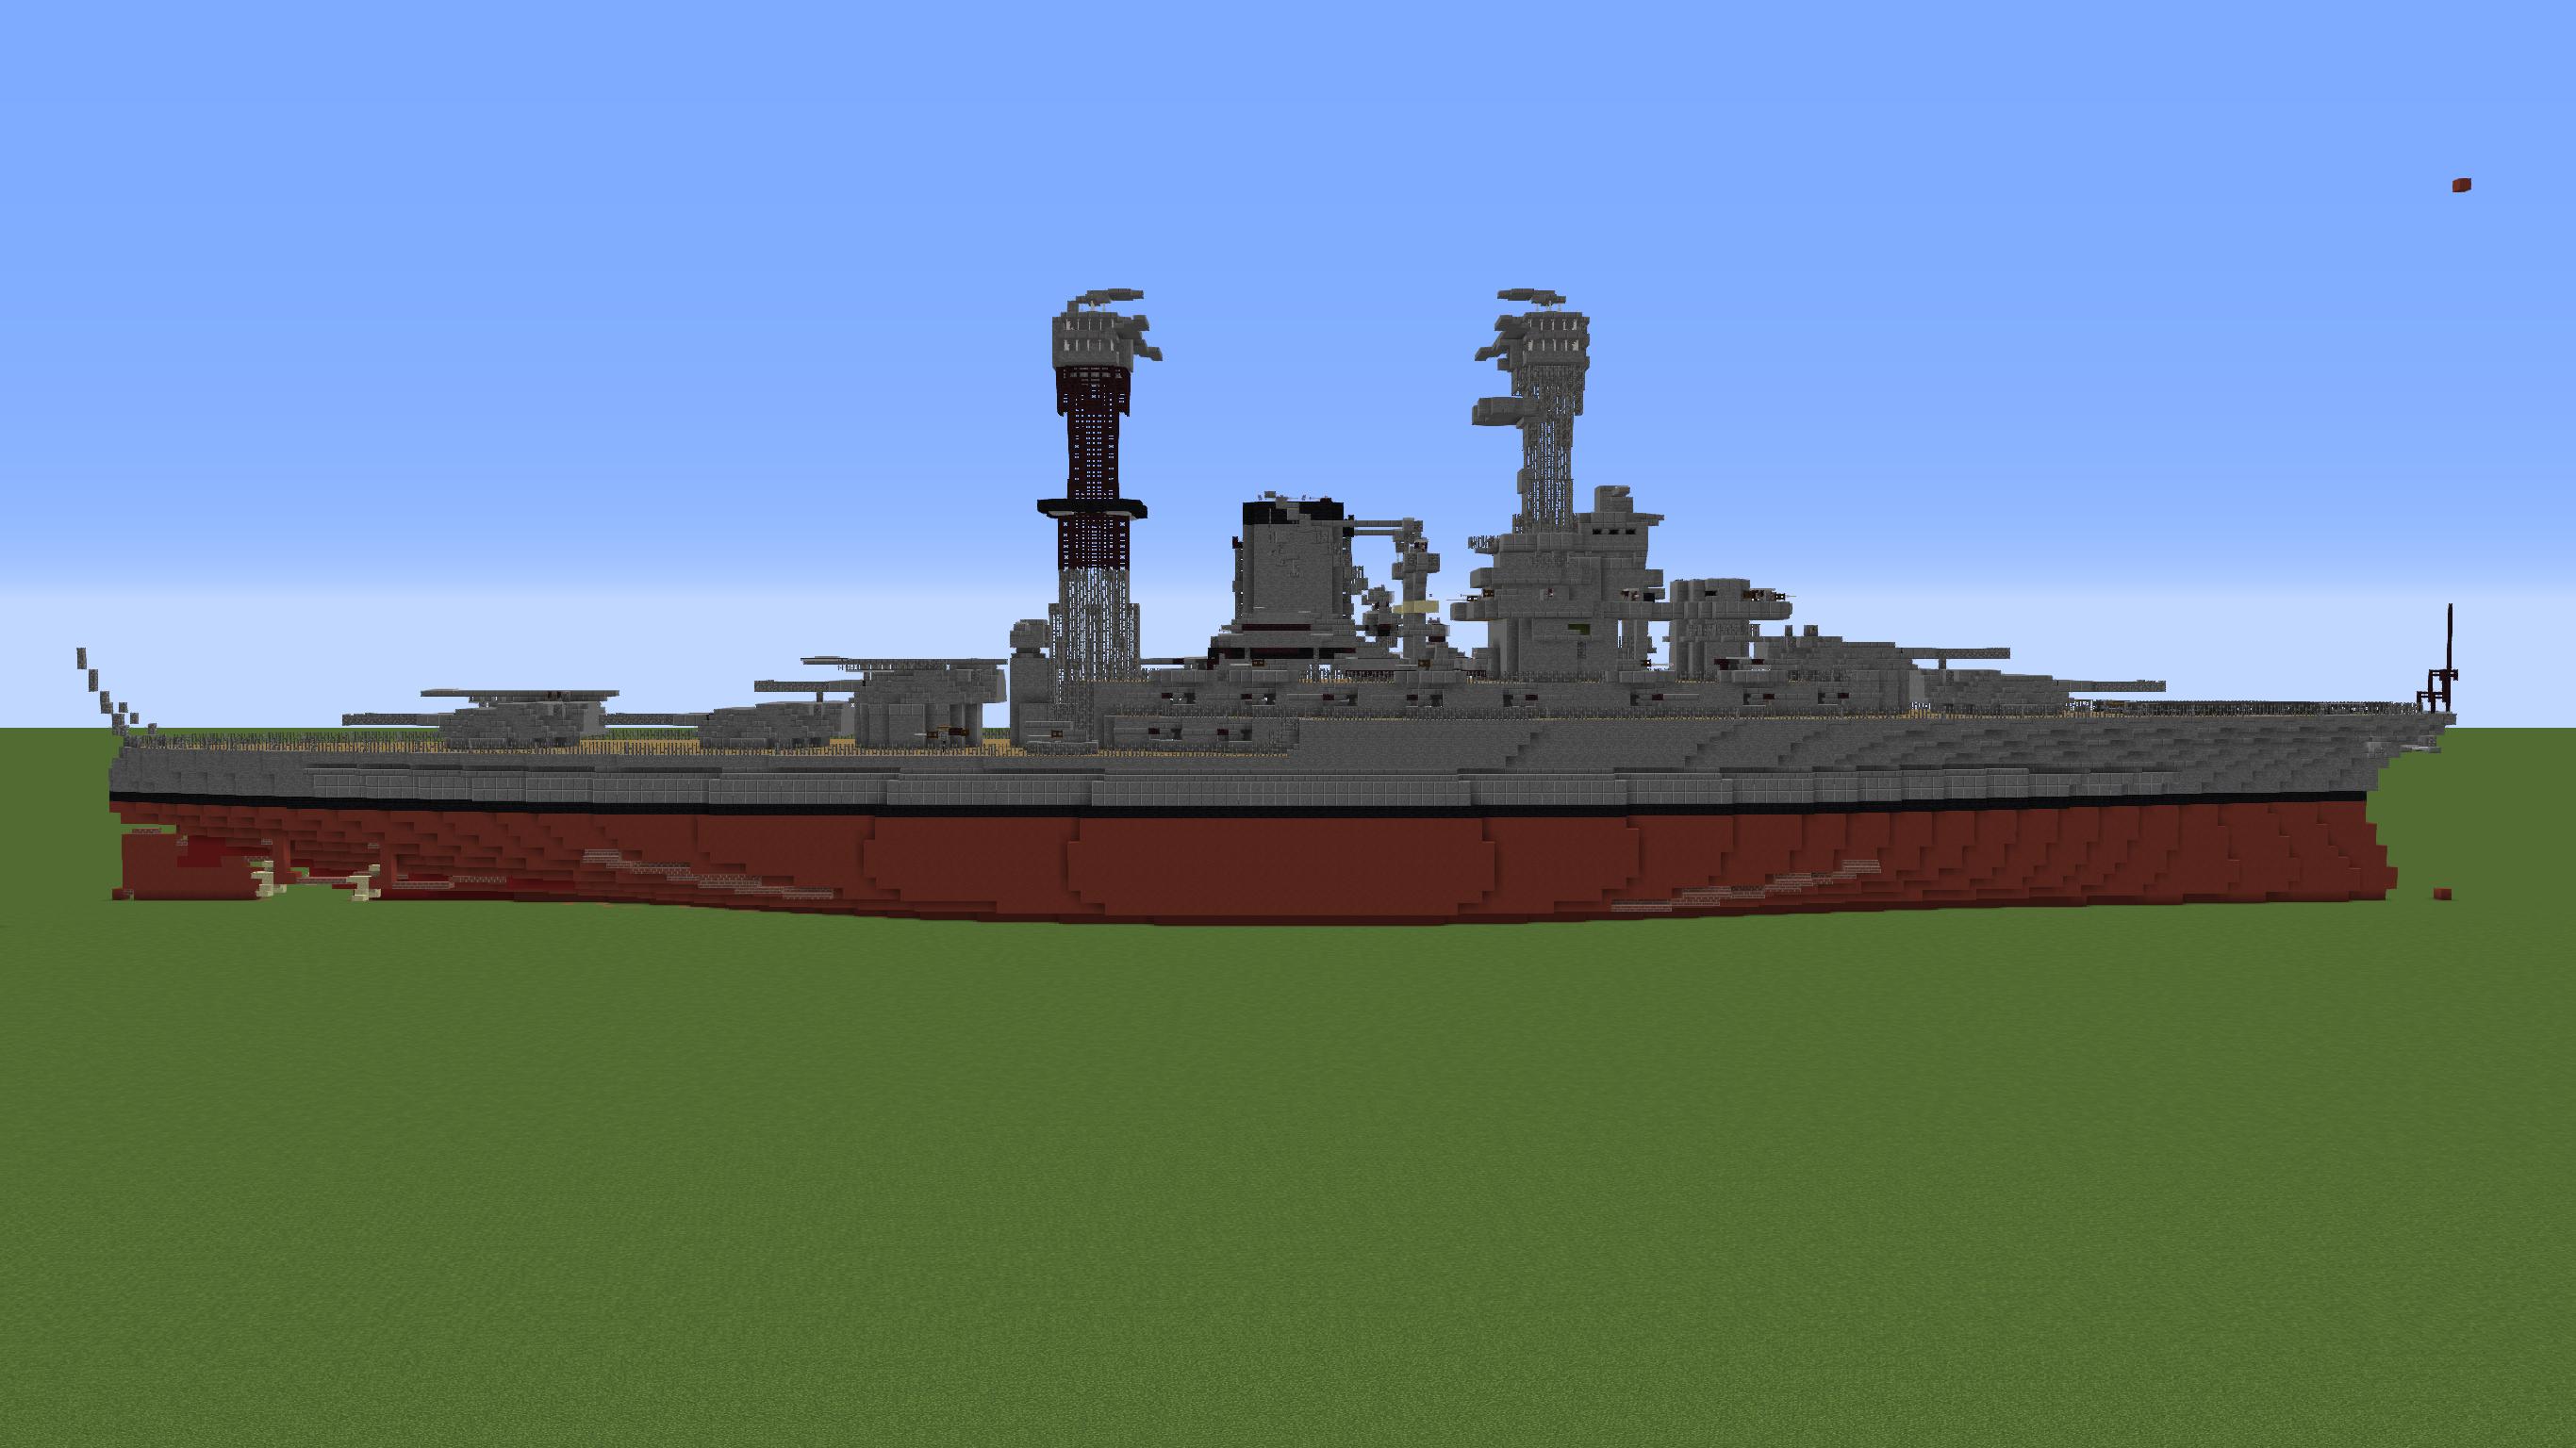 A massive super dreadnought inbound.